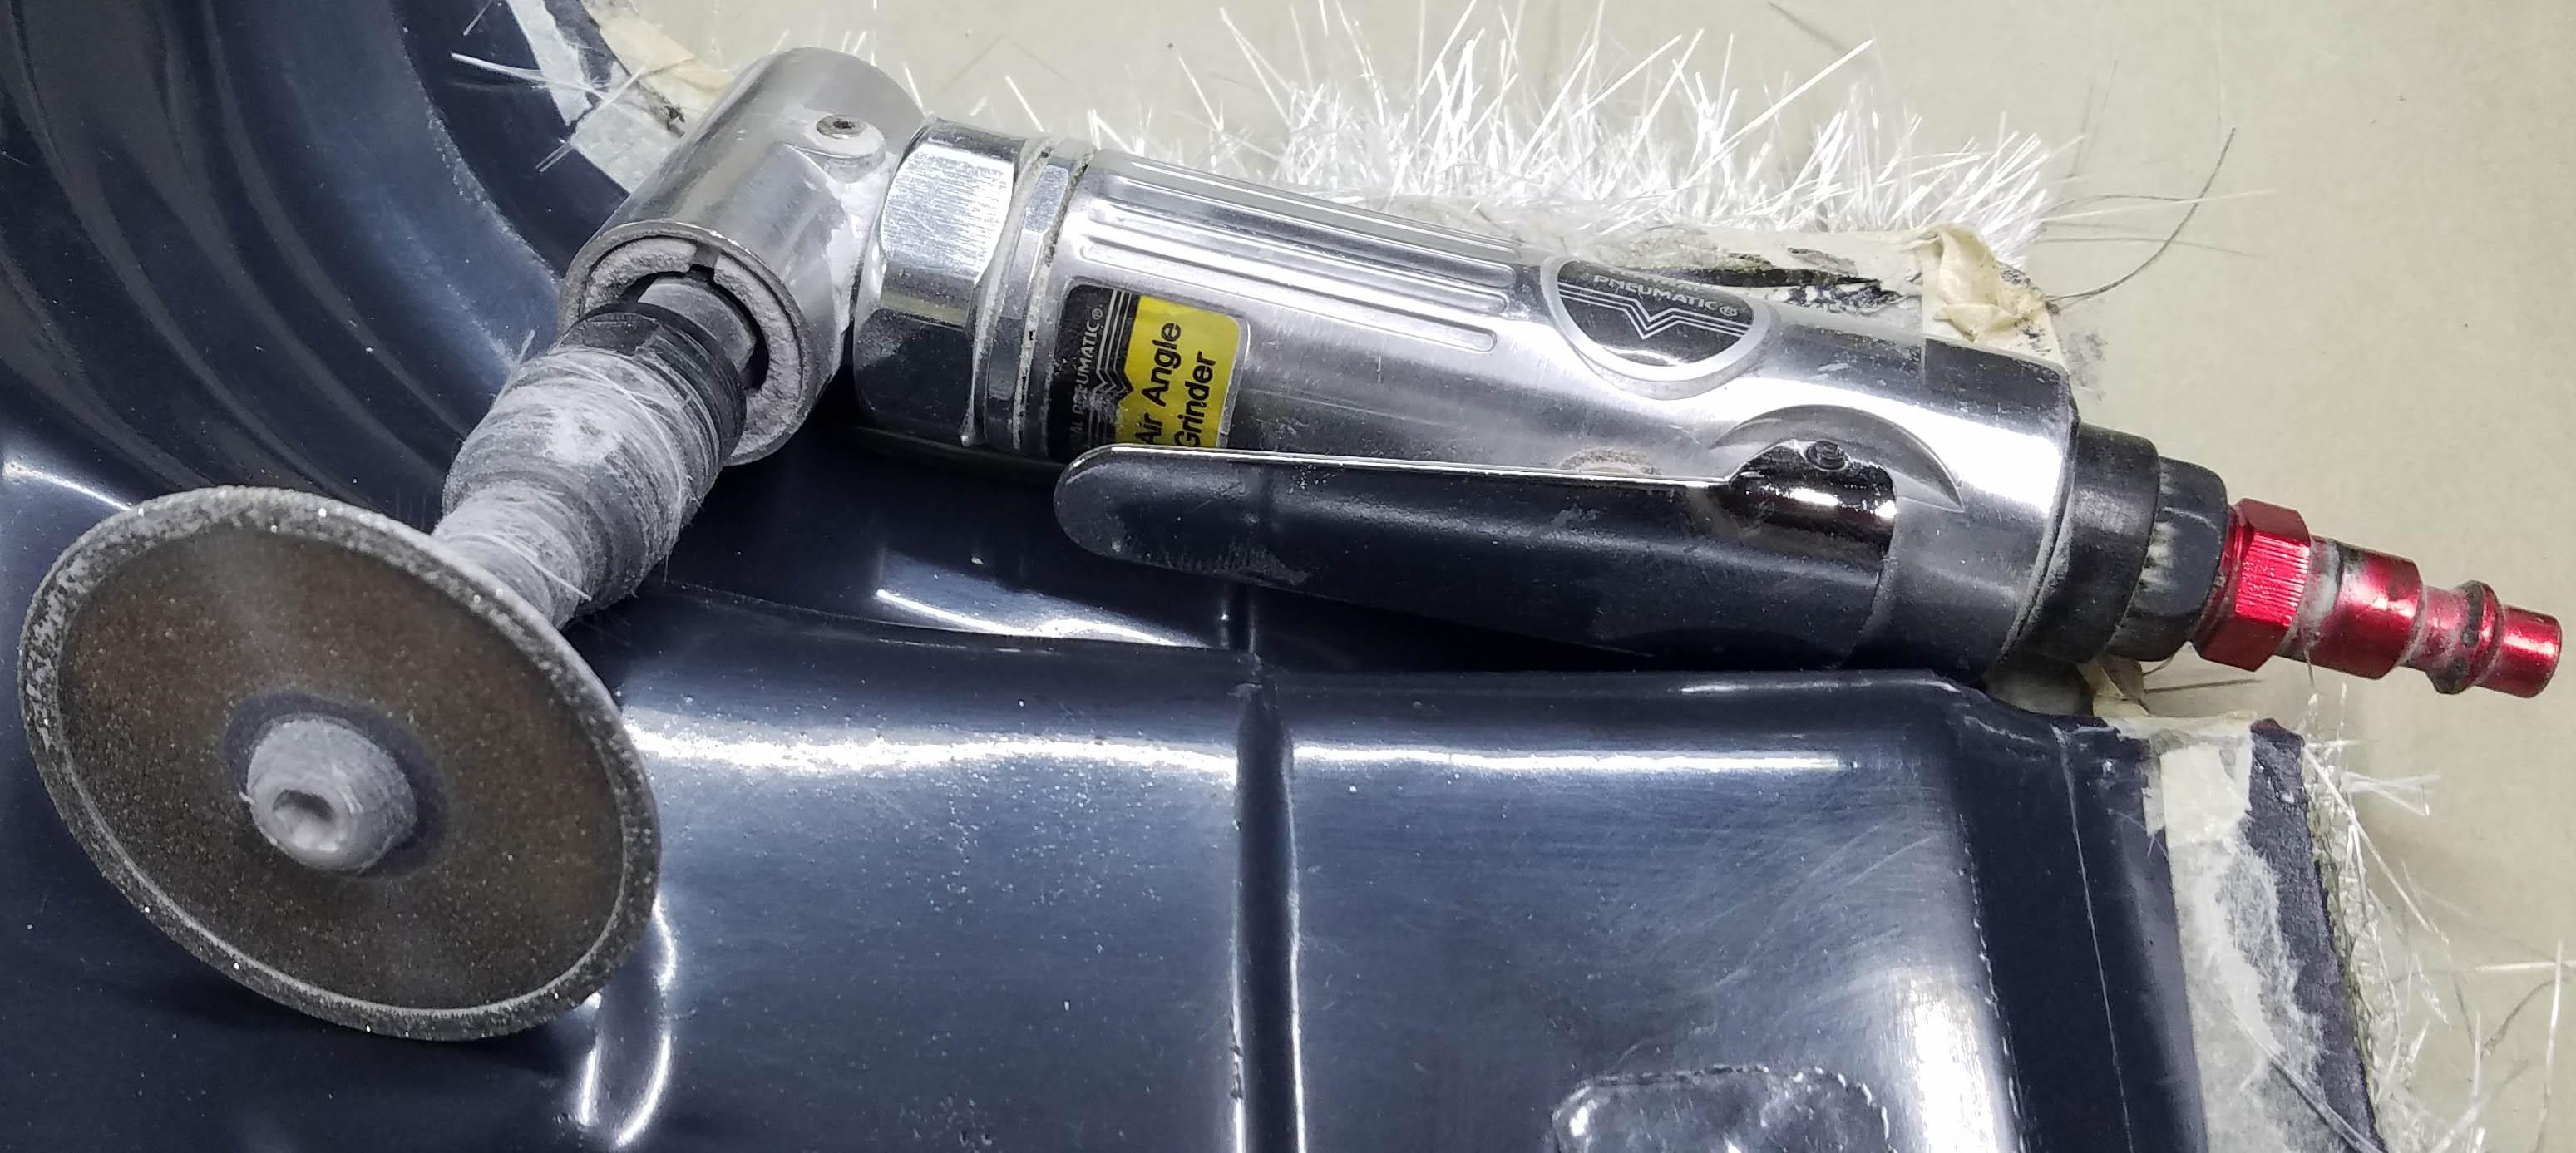 Installation Guides - Neverrust Auto Body Restoration Panels